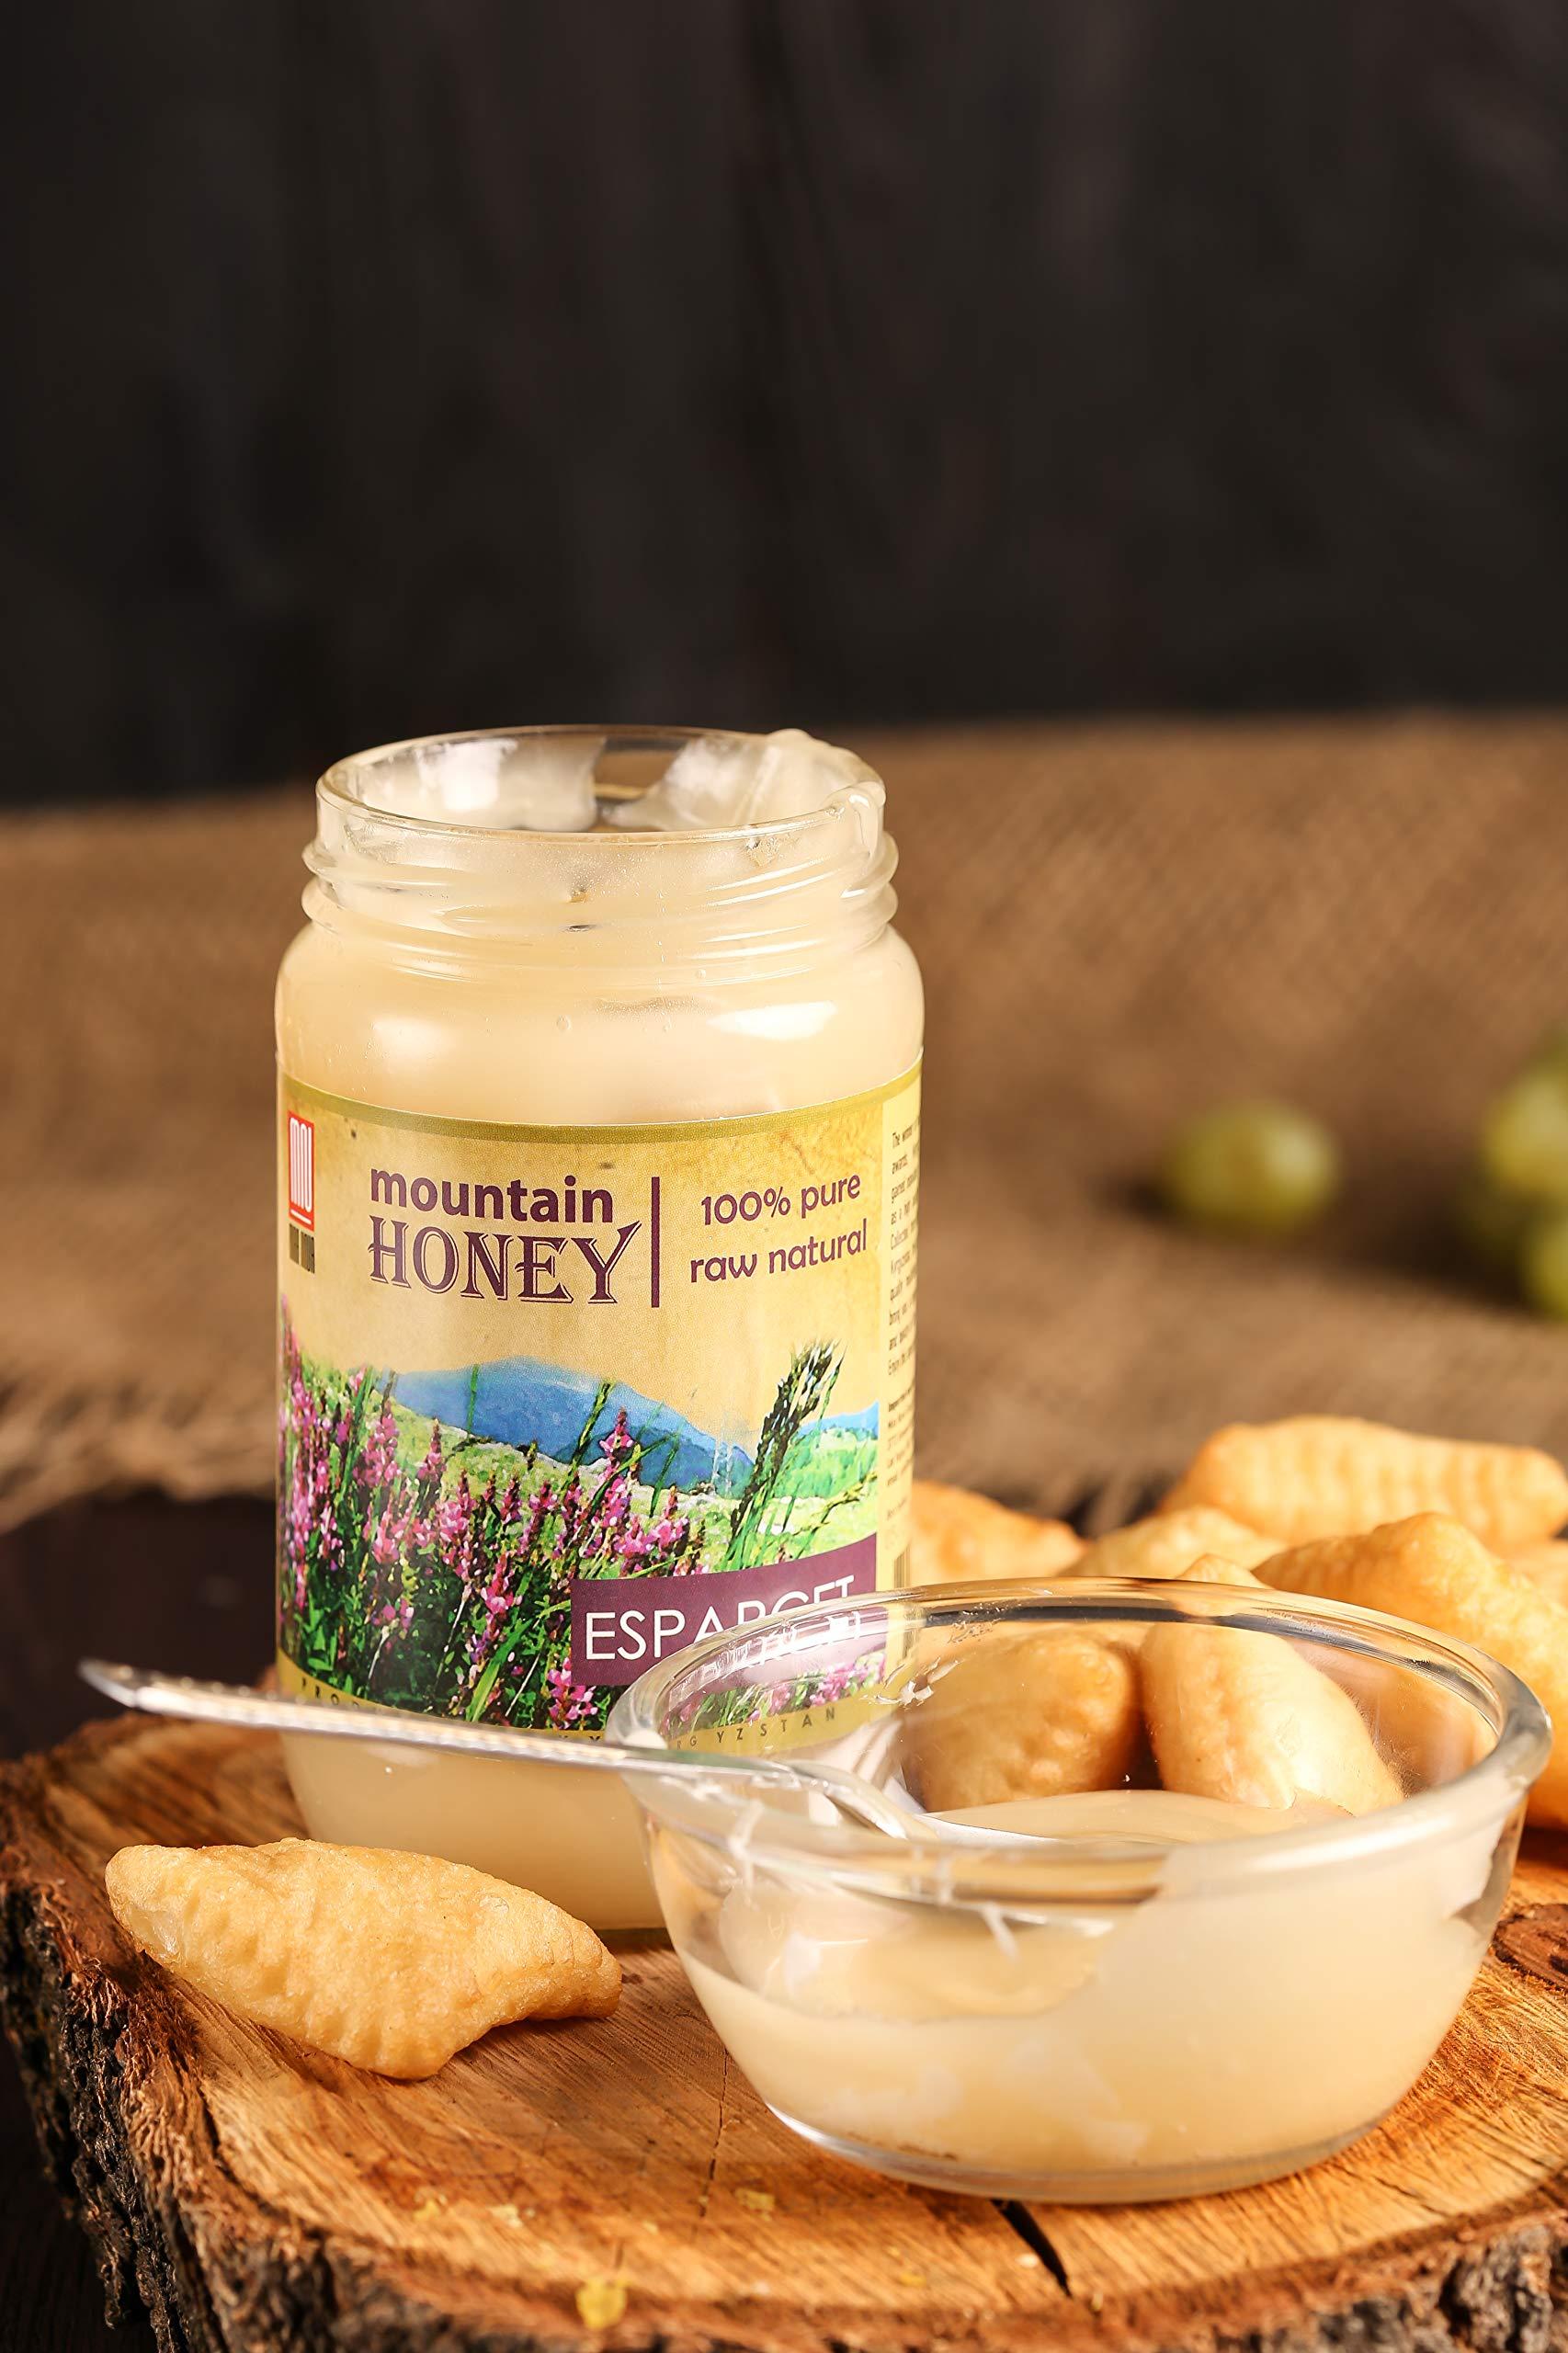 Kyrgyz Honey; Esparcet Raw Natural Sainfoin Mountain Honey; 17.63 Ounce Glass Jar by Mira Nova (Image #3)